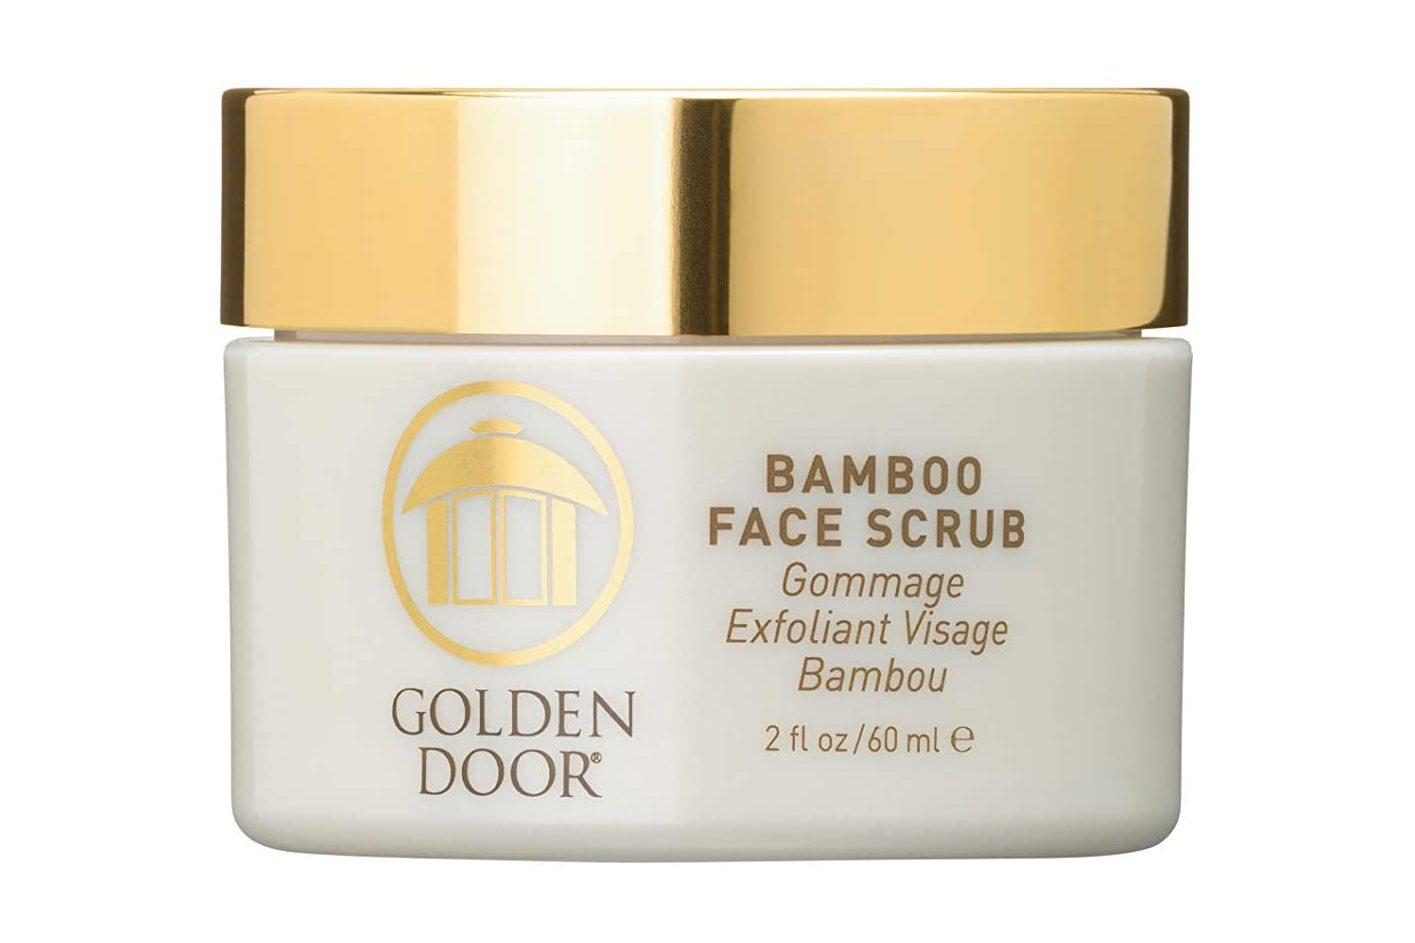 Bamboo Face Scrub